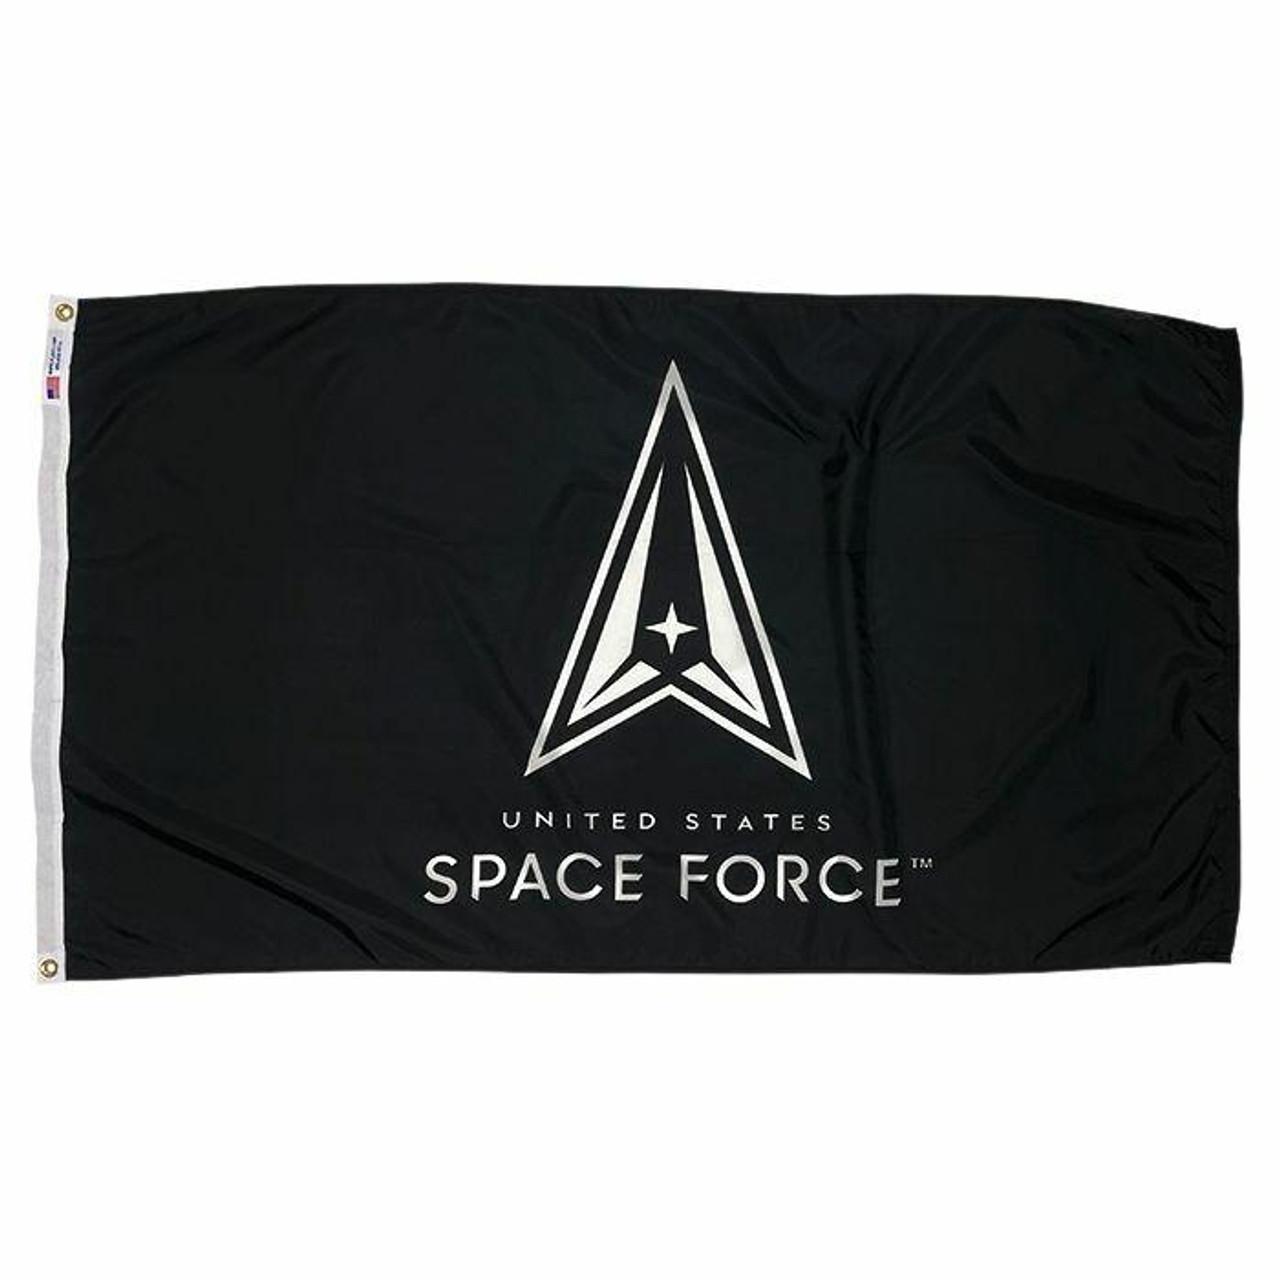 Space Force (Civilian) Flag